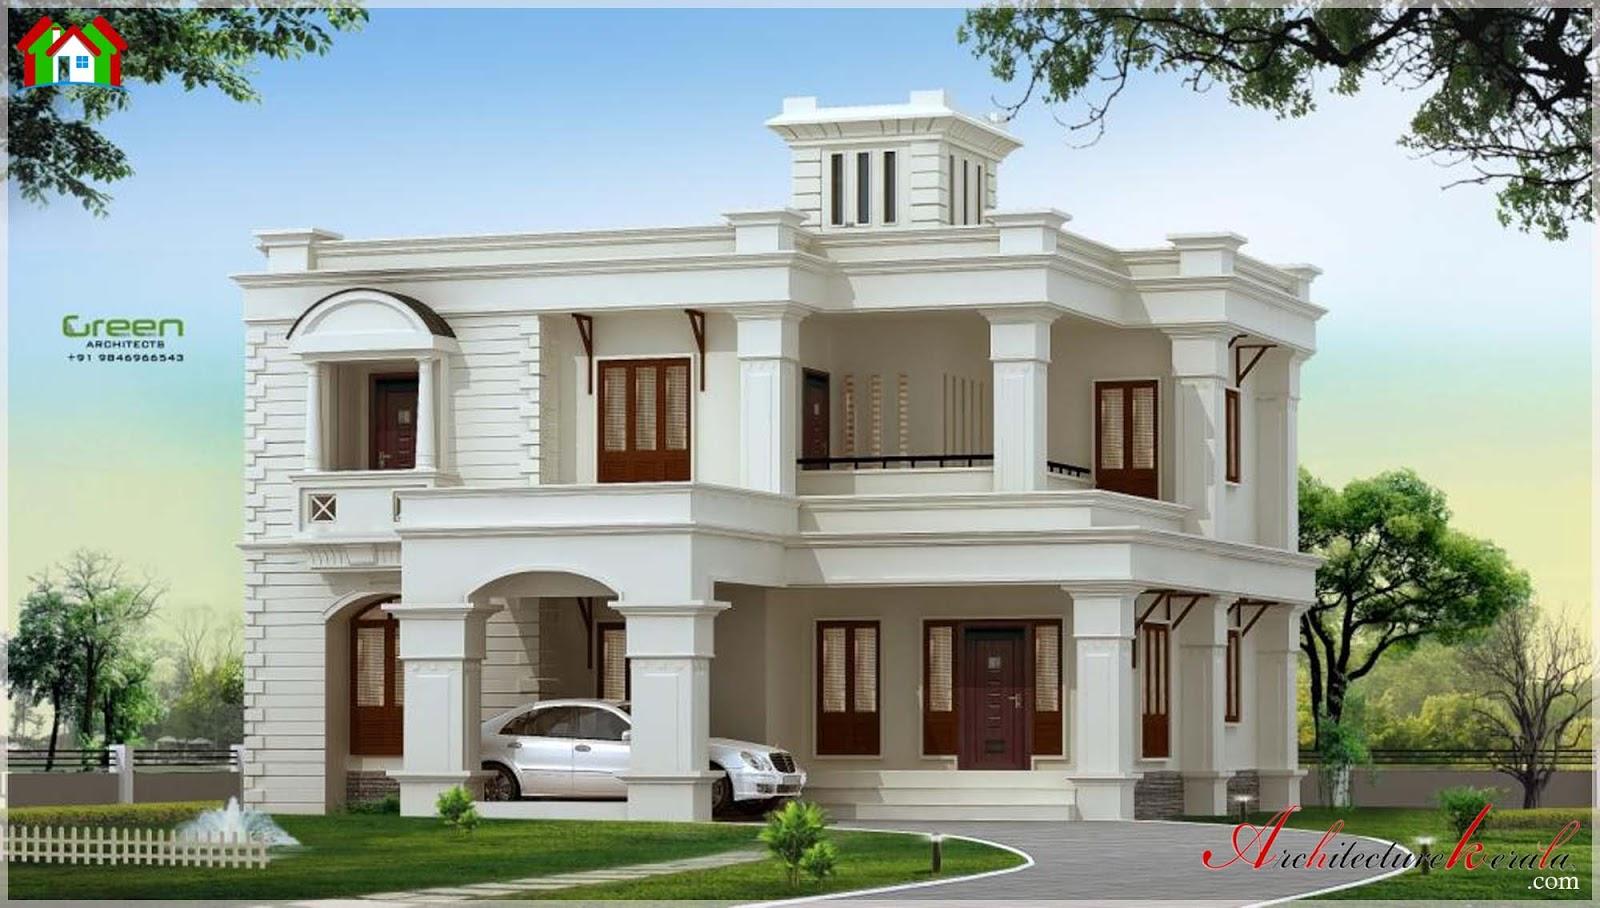 Duplex House Elevation Sq Bungalow Elevations Duplex Kerala House